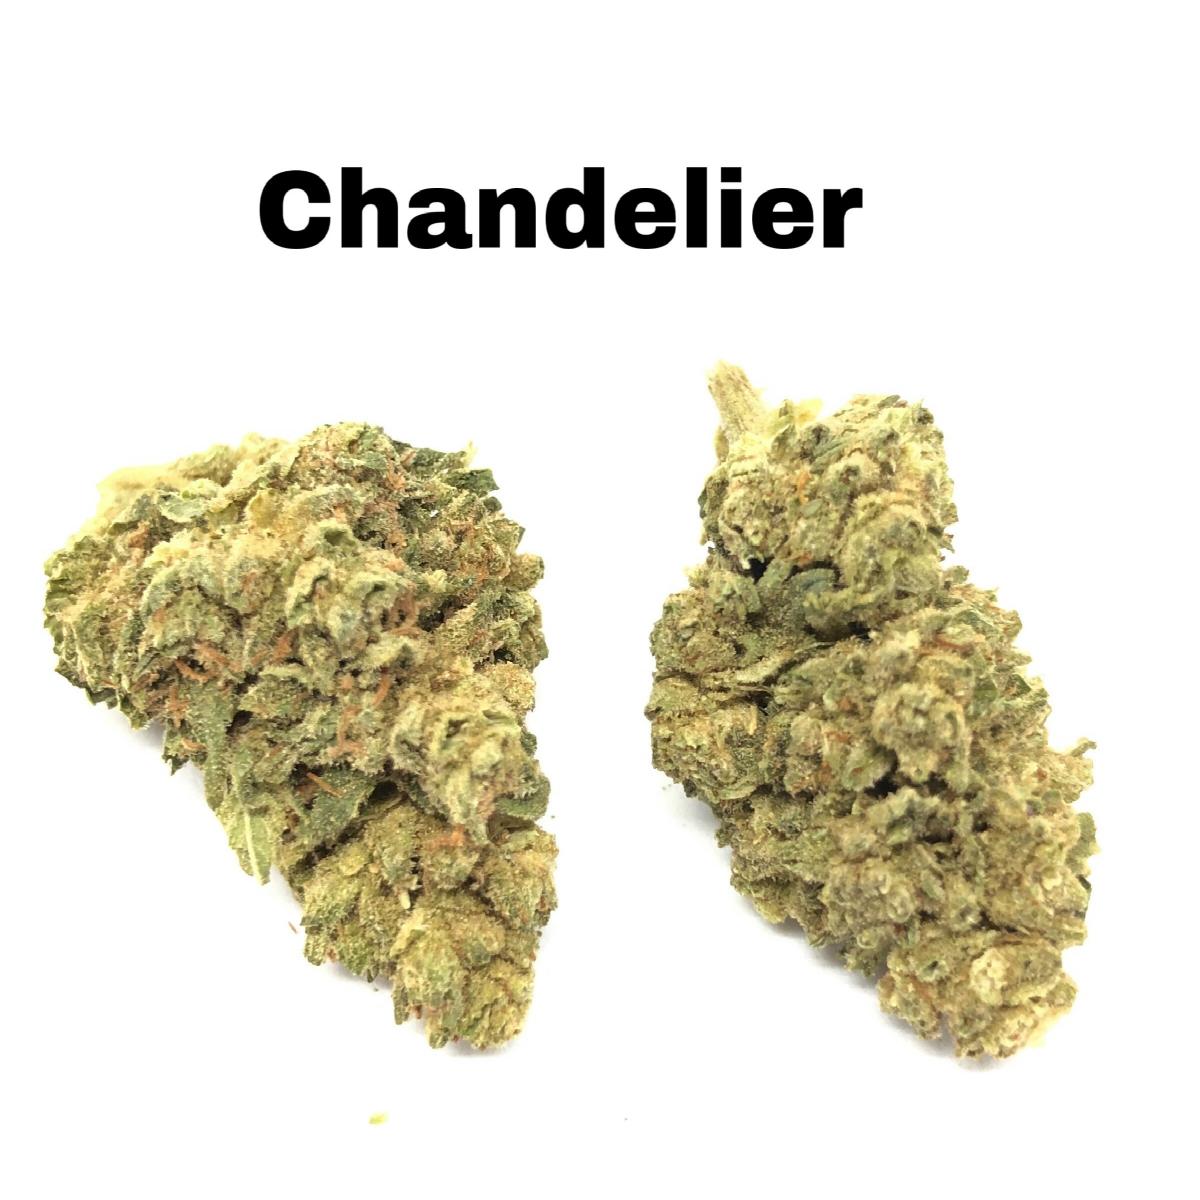 Chandelier CBD Hemp Flower